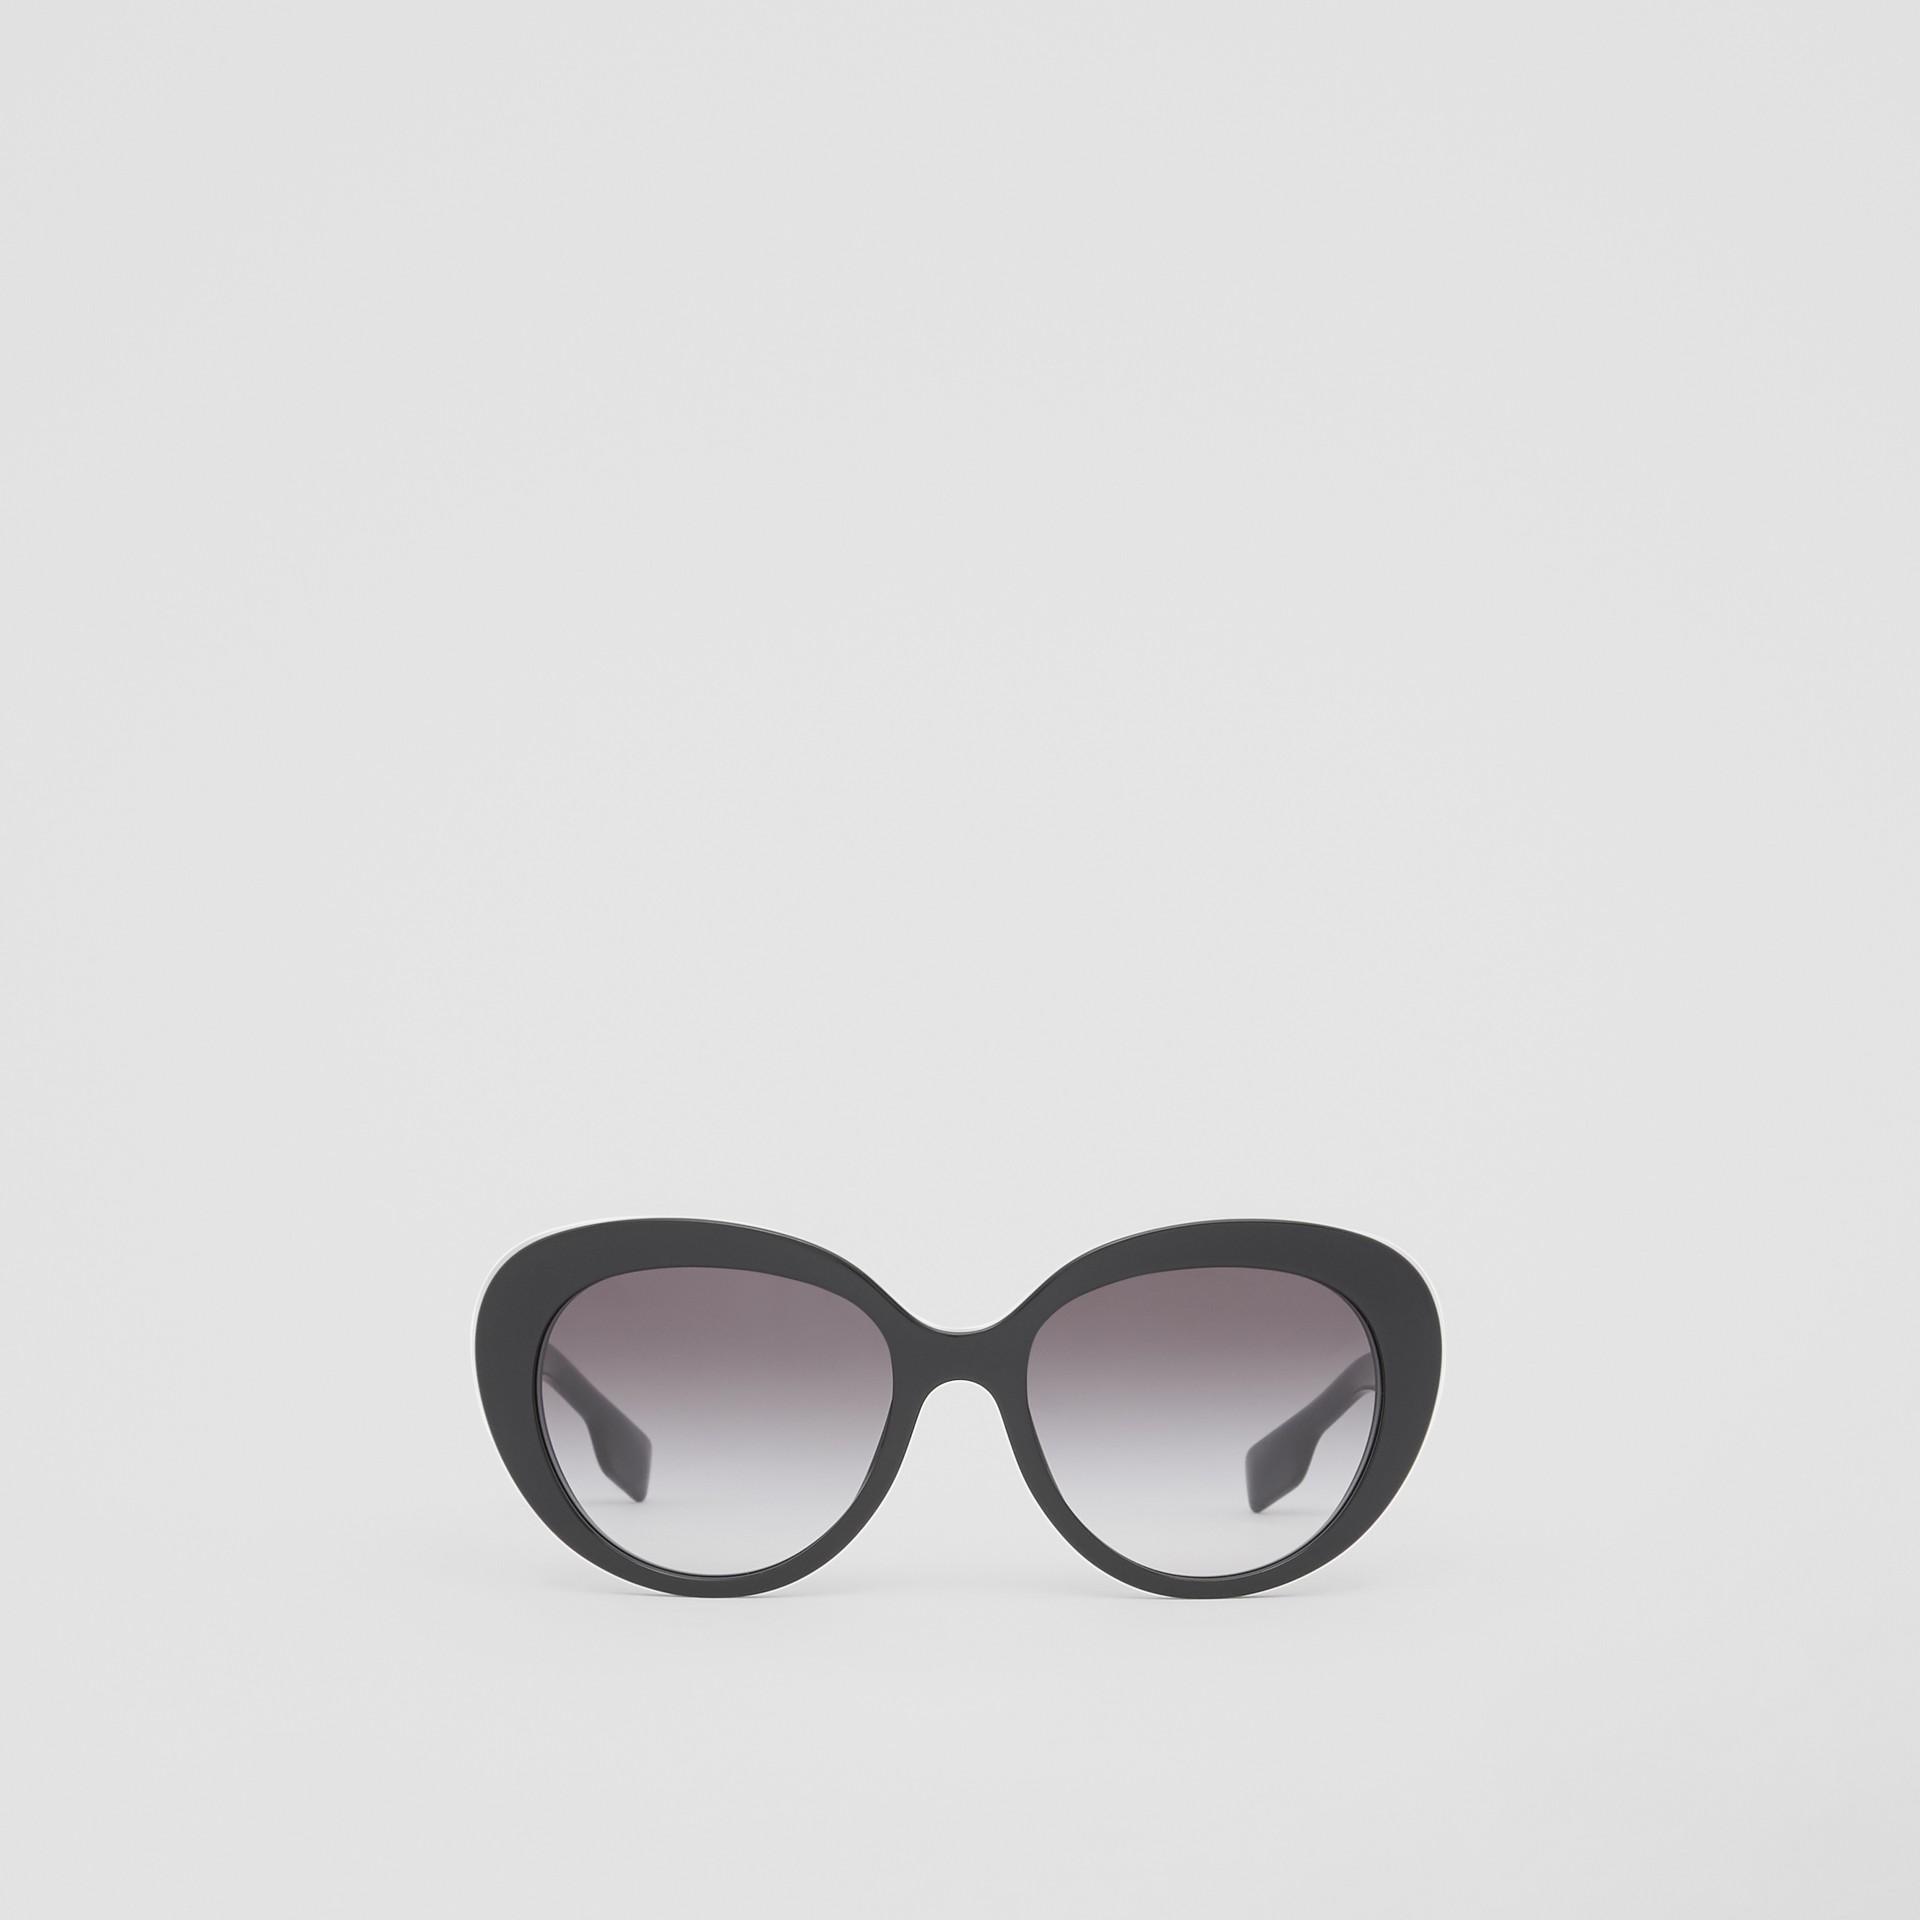 Monogram Motif Cat-eye Frame Sunglasses in Black - Women | Burberry Australia - gallery image 0